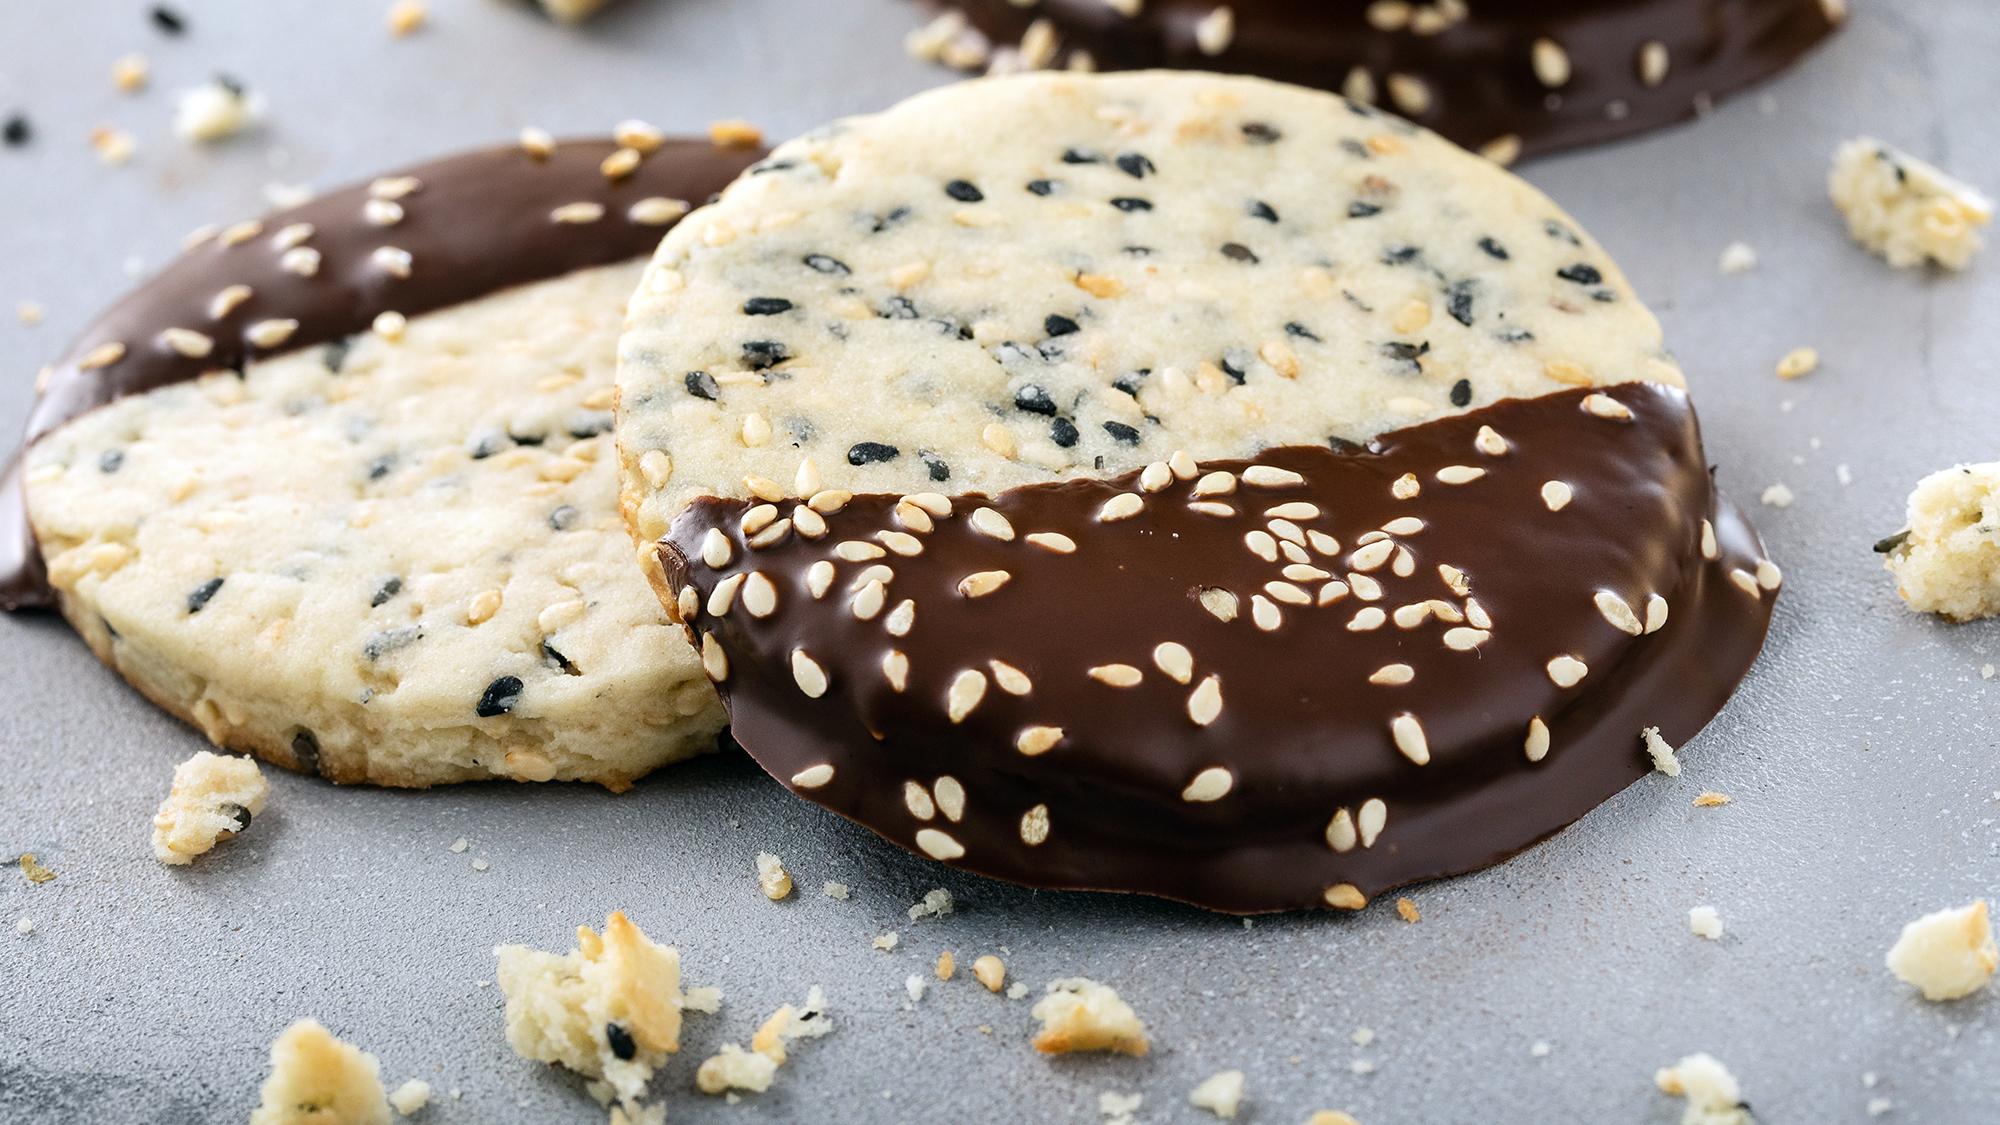 mcCormick Chocolate Dipped Sesame Cookies